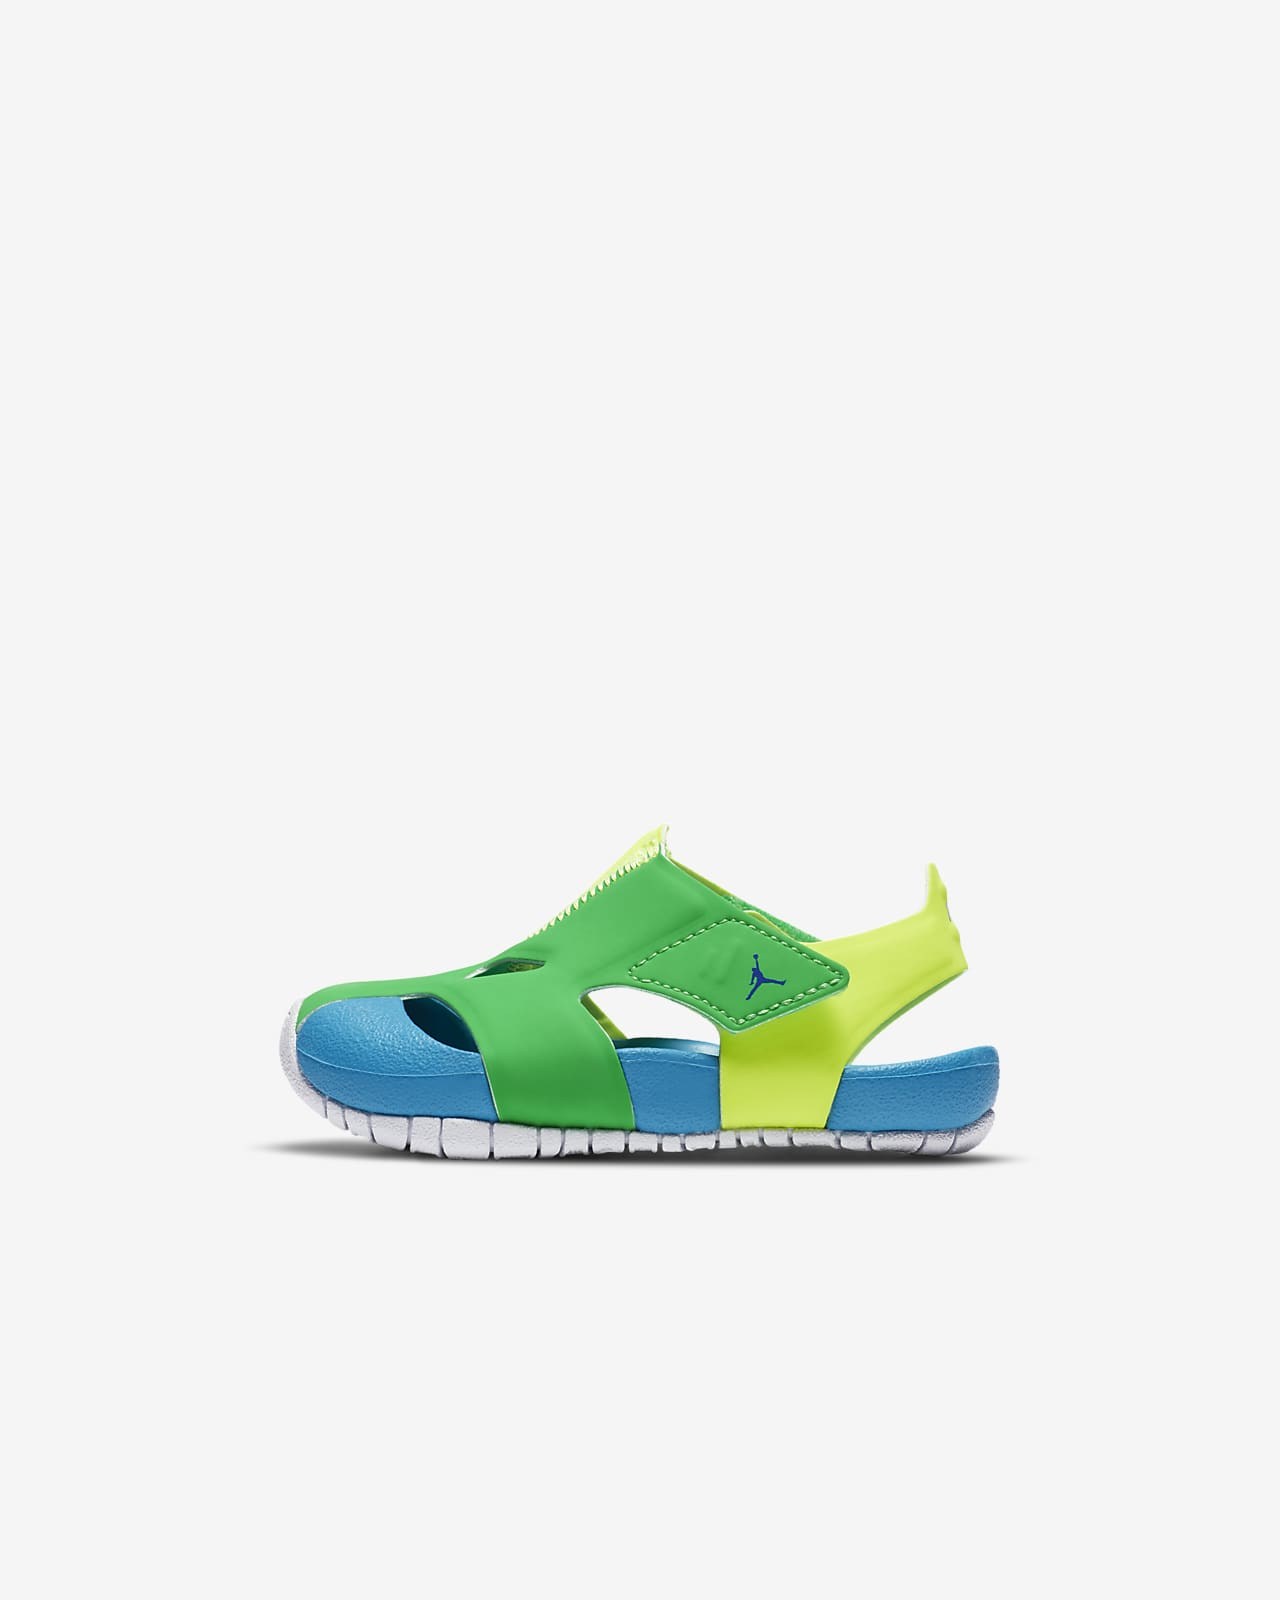 Jordan Flare Zapatillas - Bebé e infantil